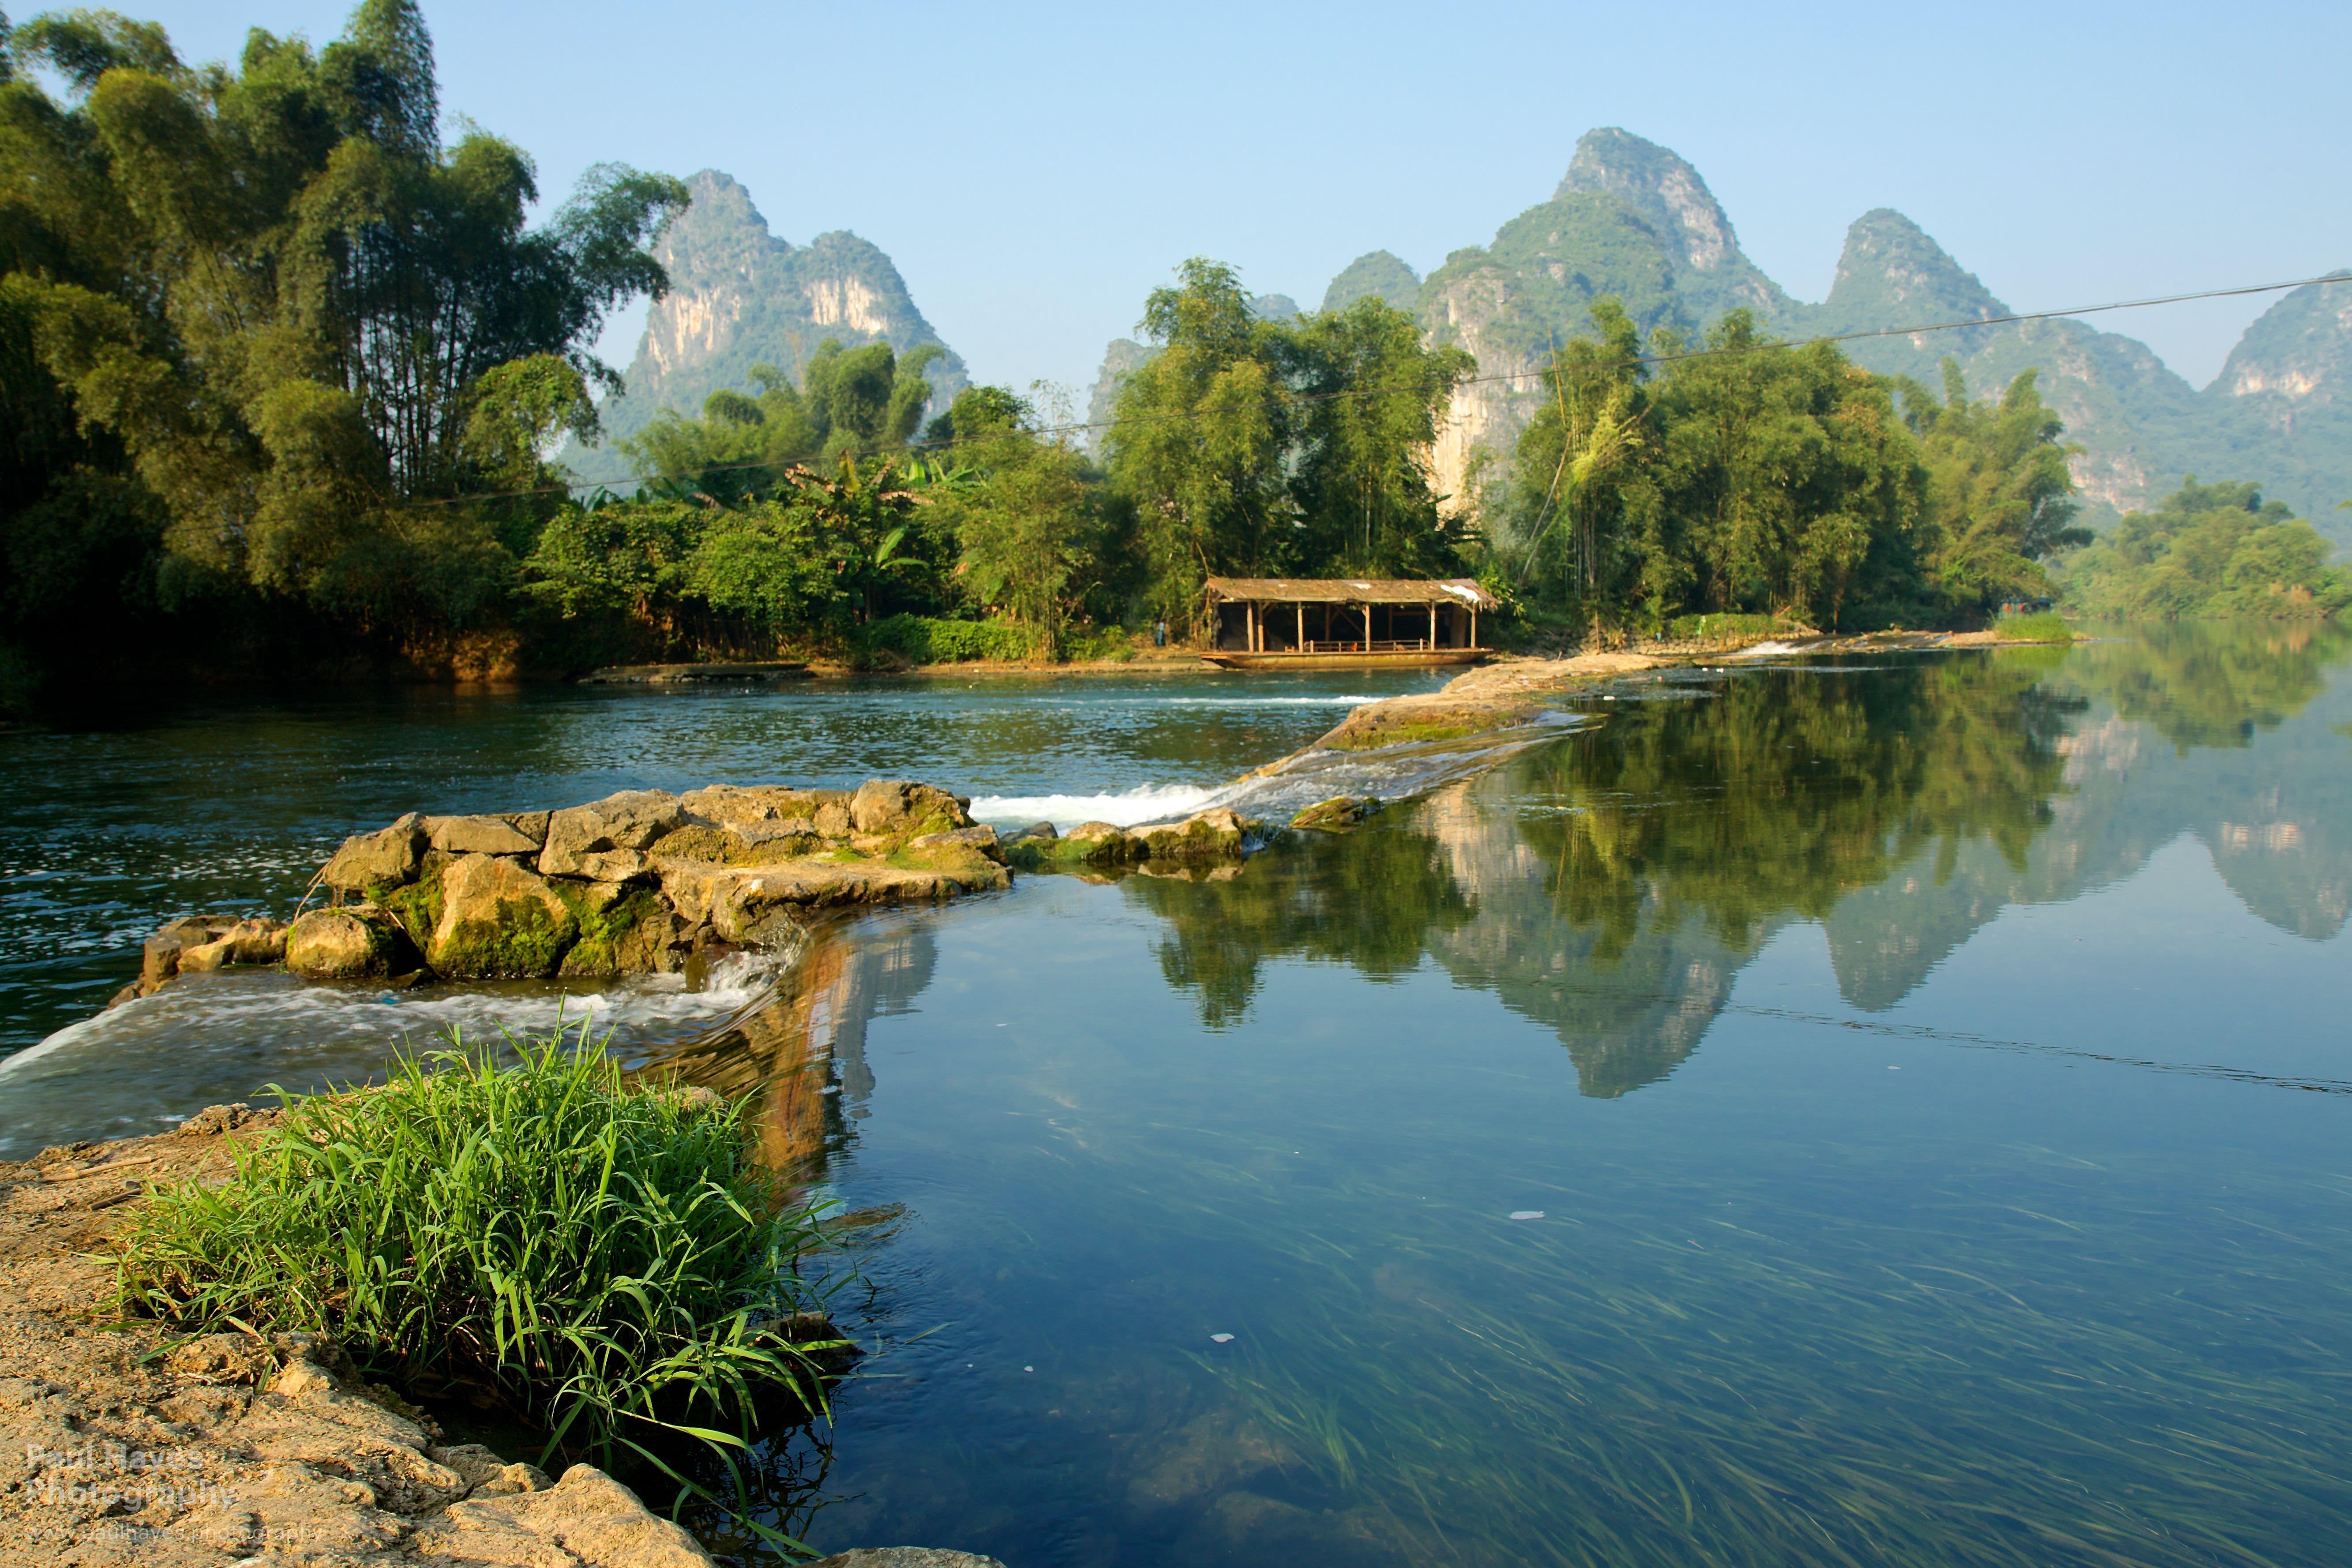 Best 34 Yulong River Wallpaper on HipWallpaper Yulong River 5331x3554